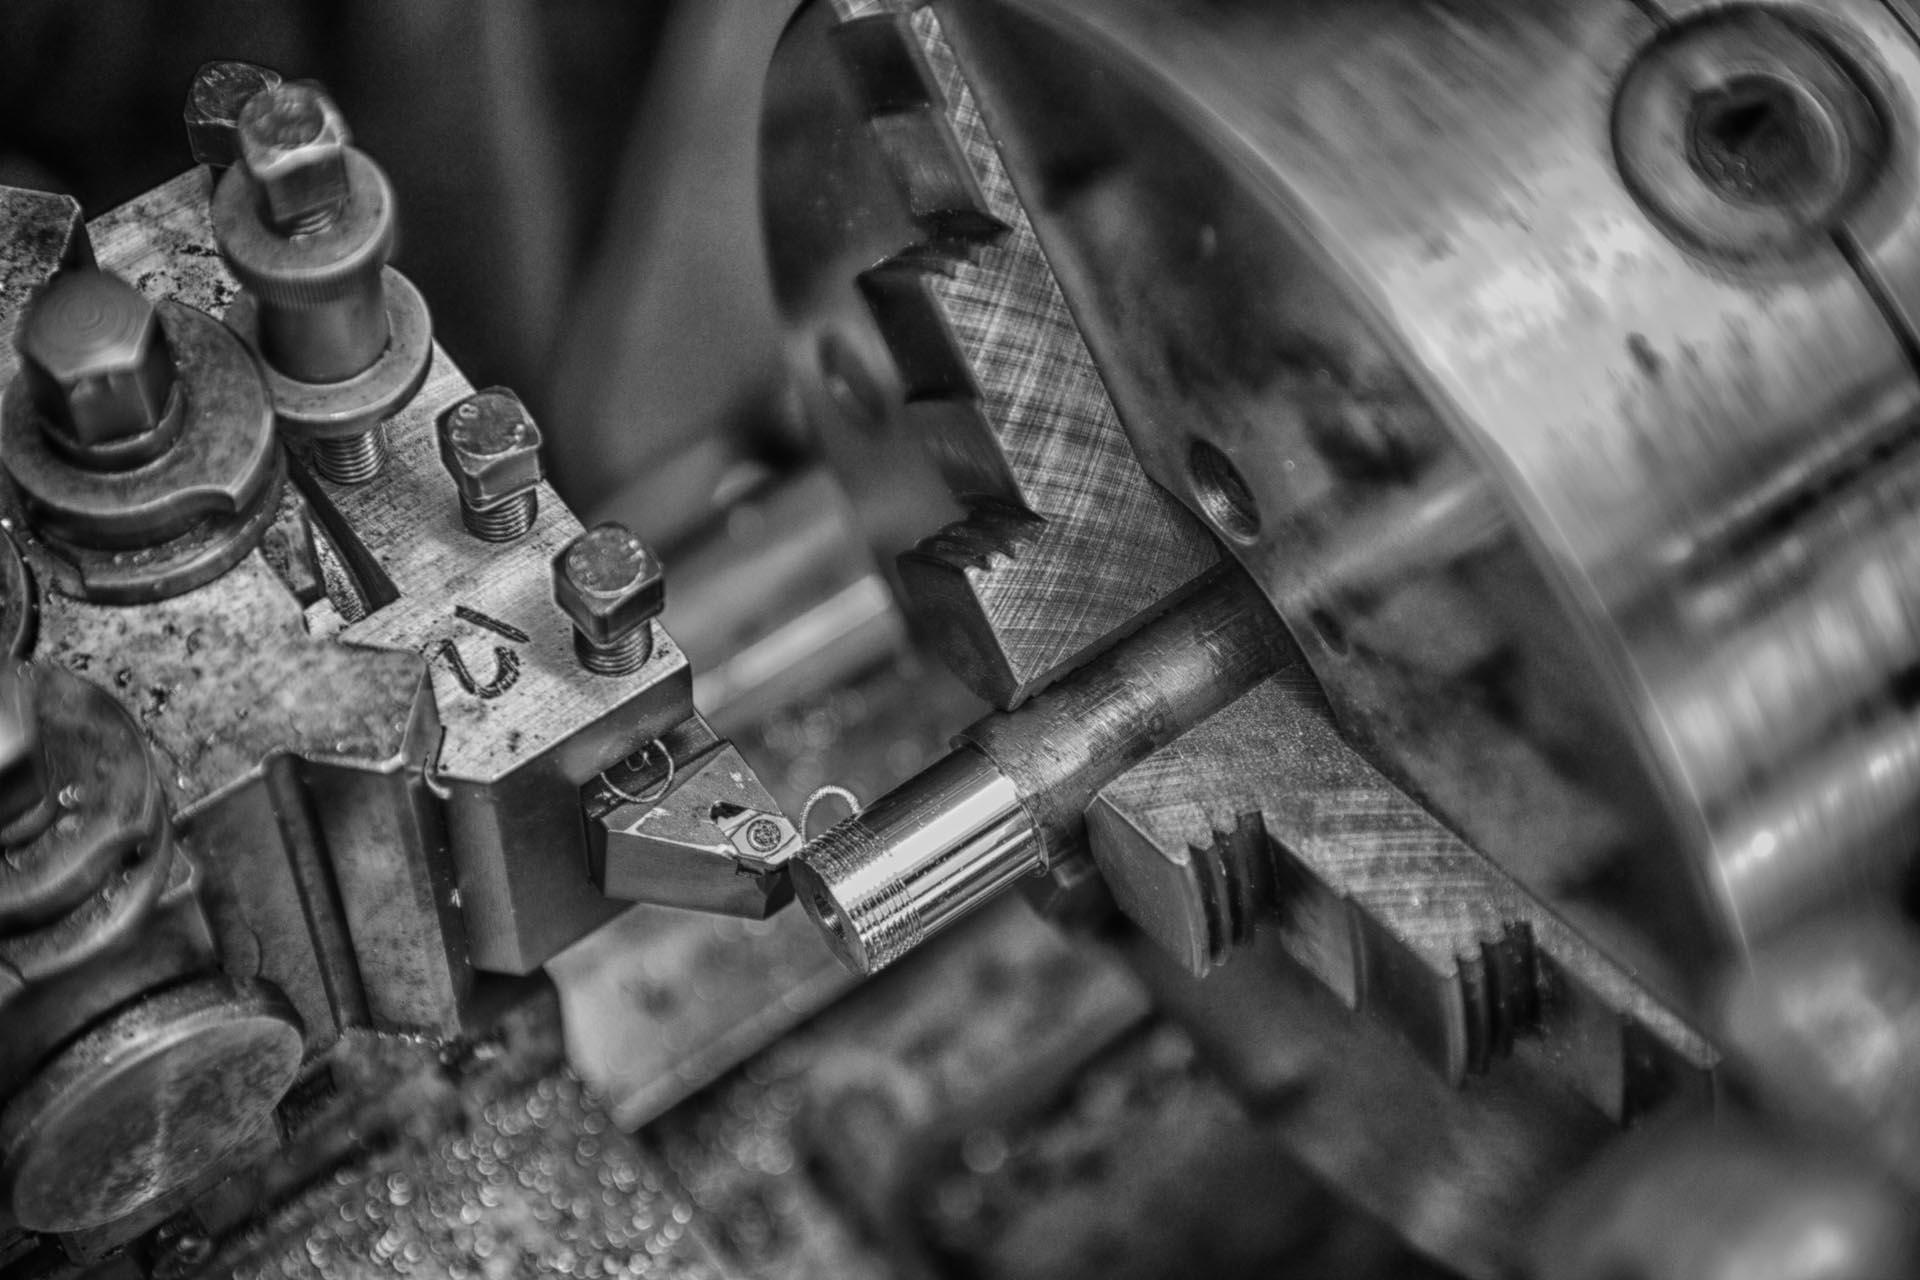 engine machine shop tools